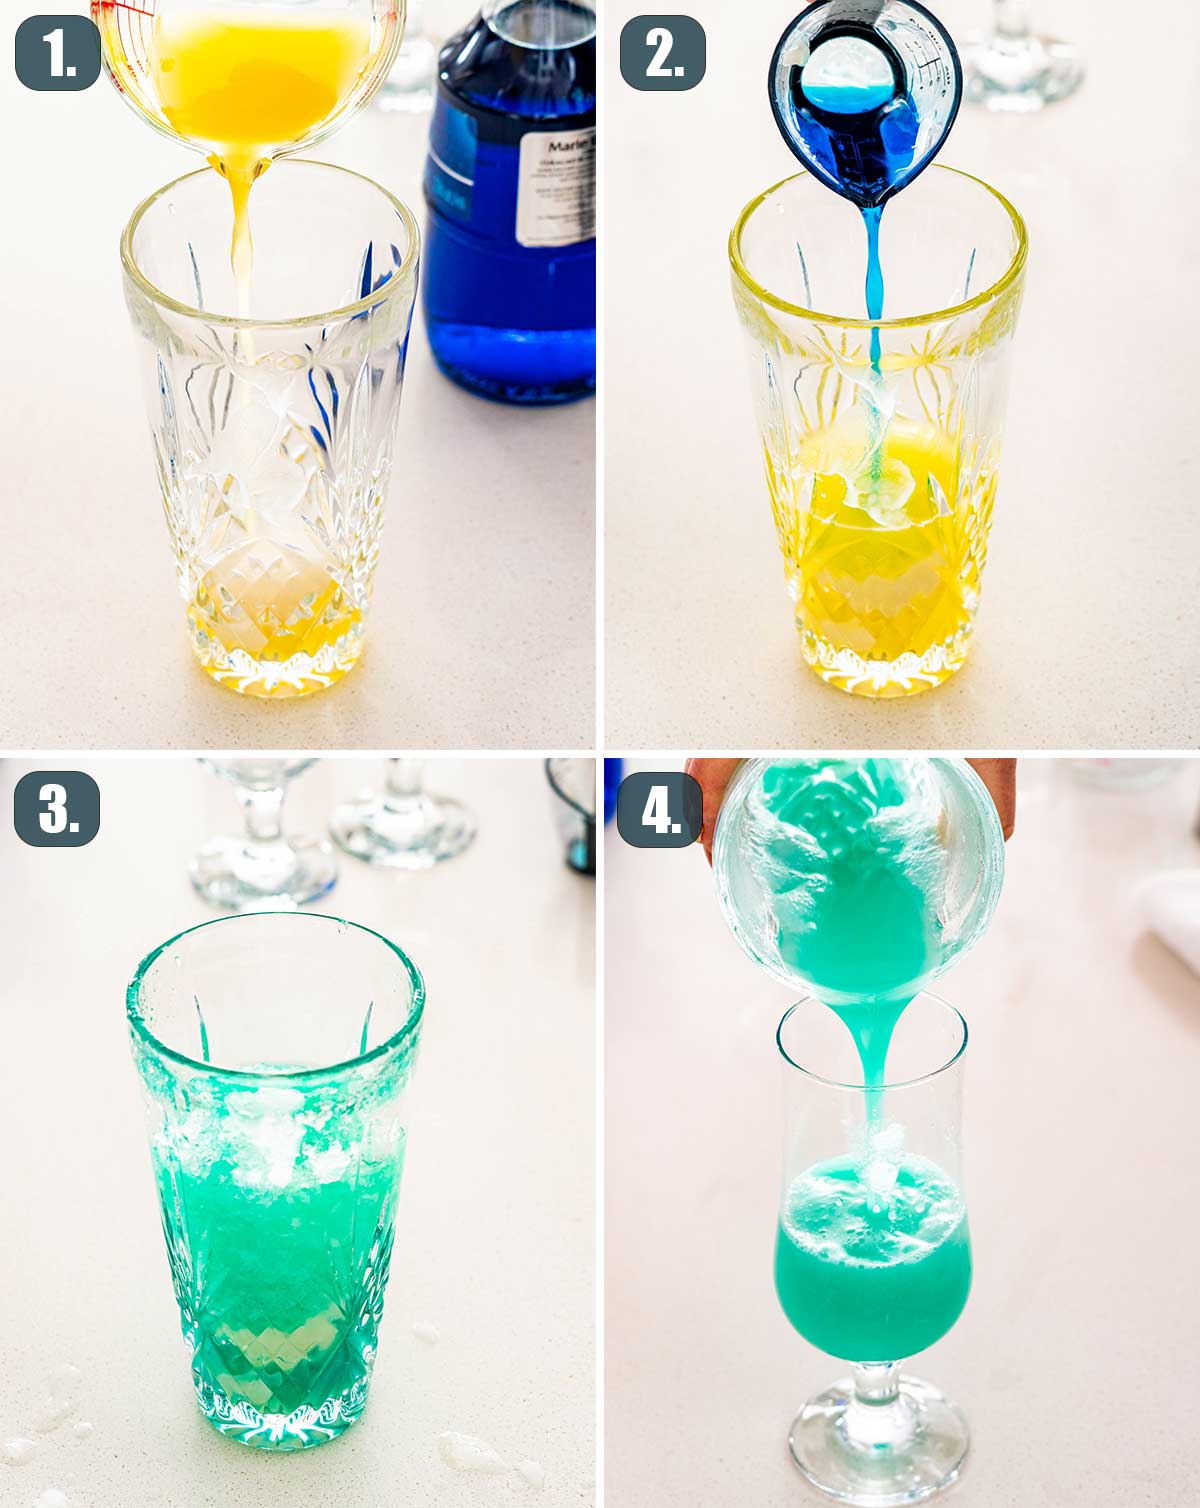 process shots showing how to make blue hawaiian.